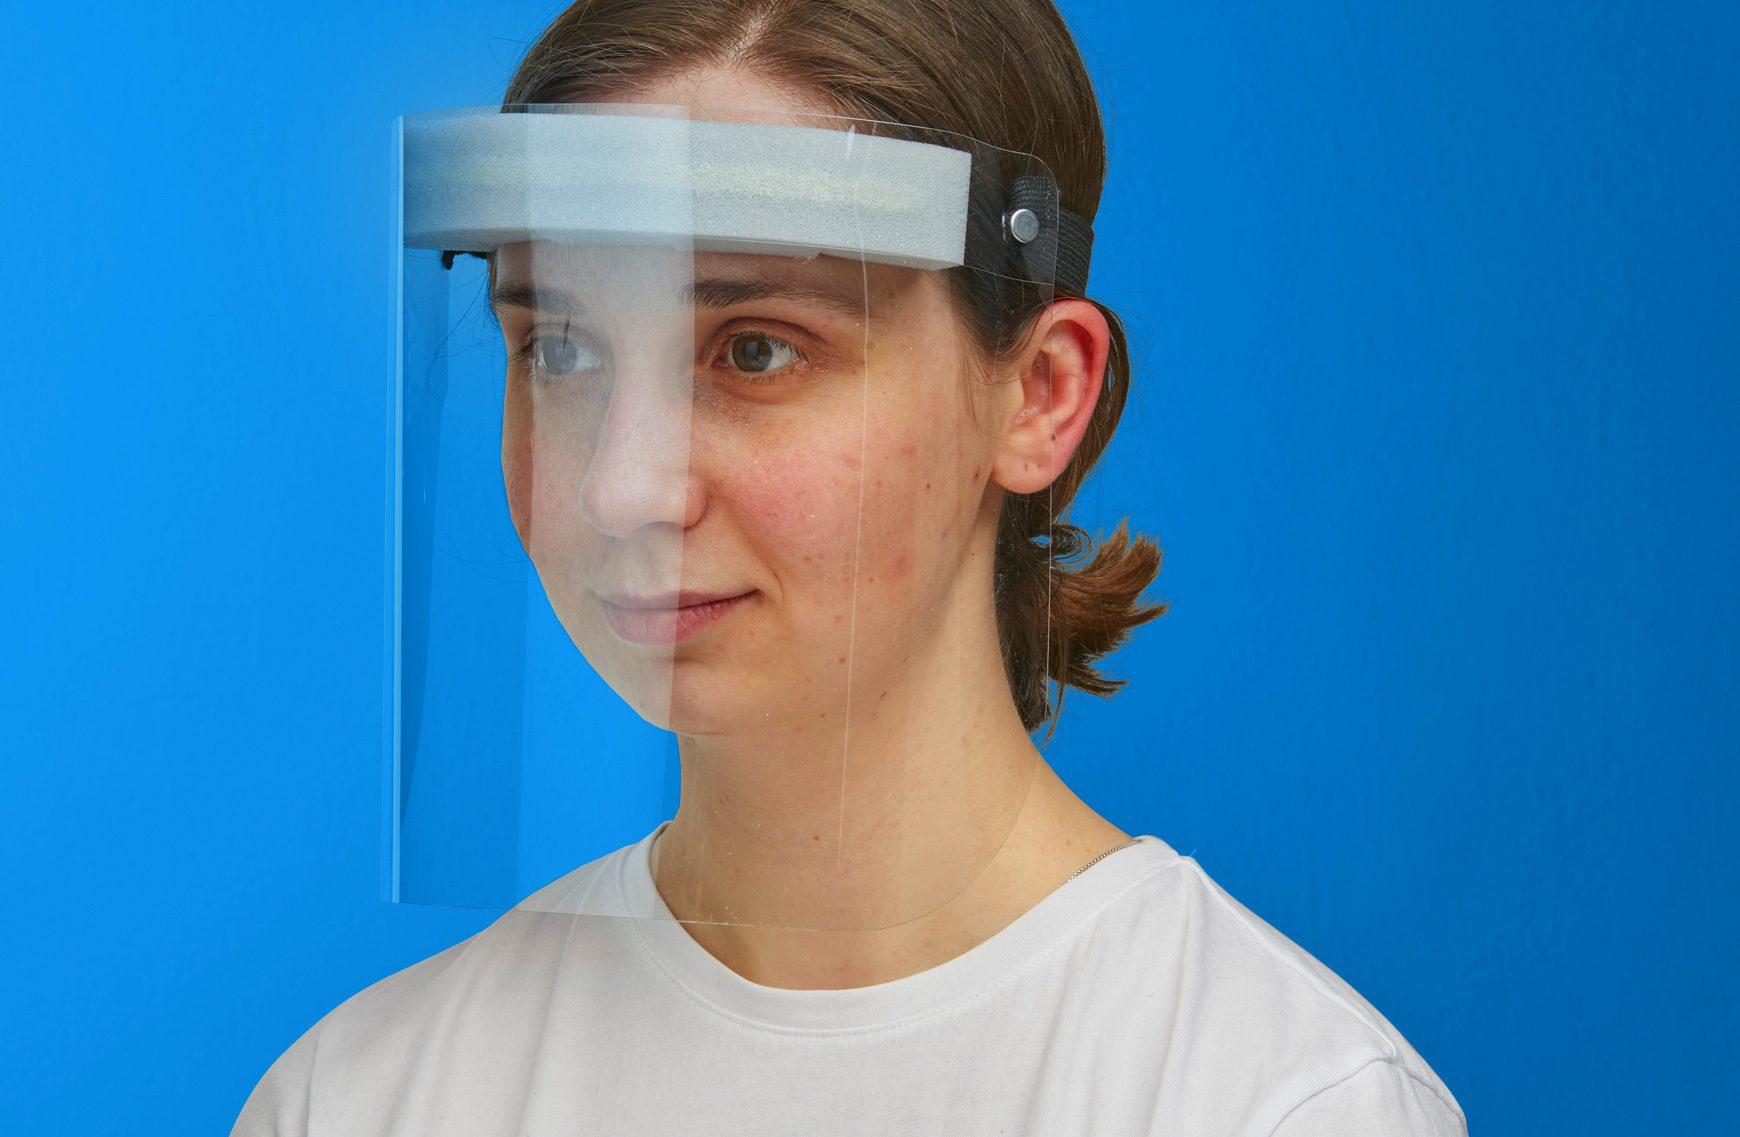 Woman wearing ppe face visor